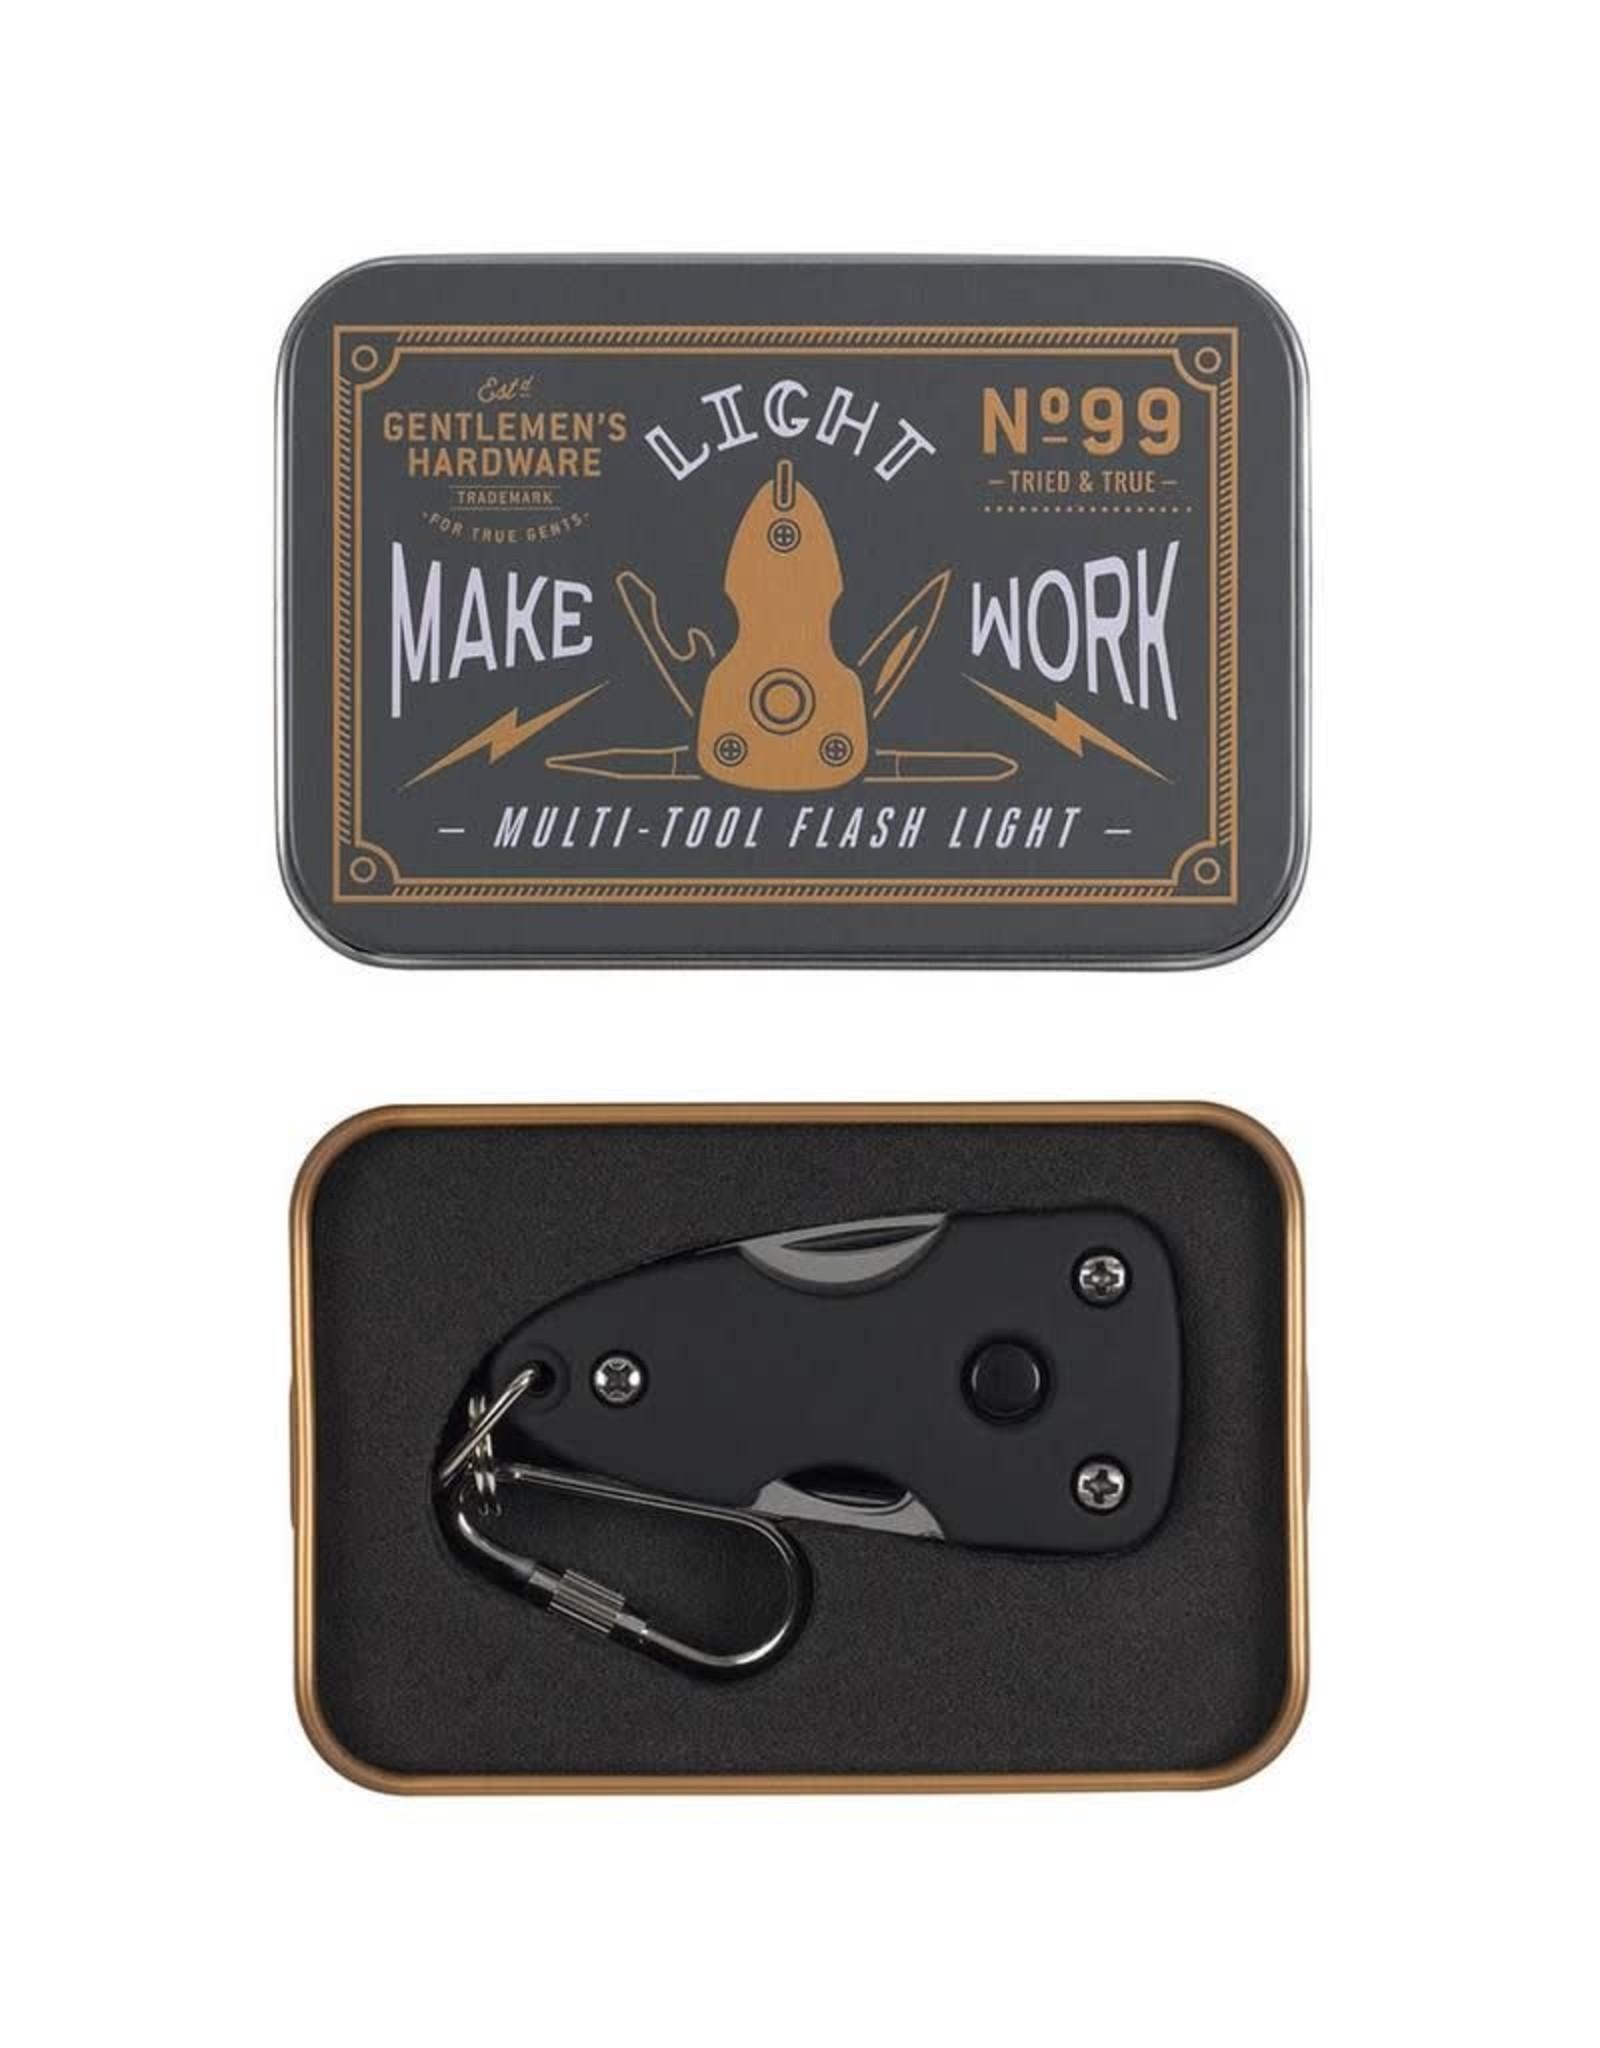 Gentlemen's Hardware Pocket Multi Tool with Flash Light